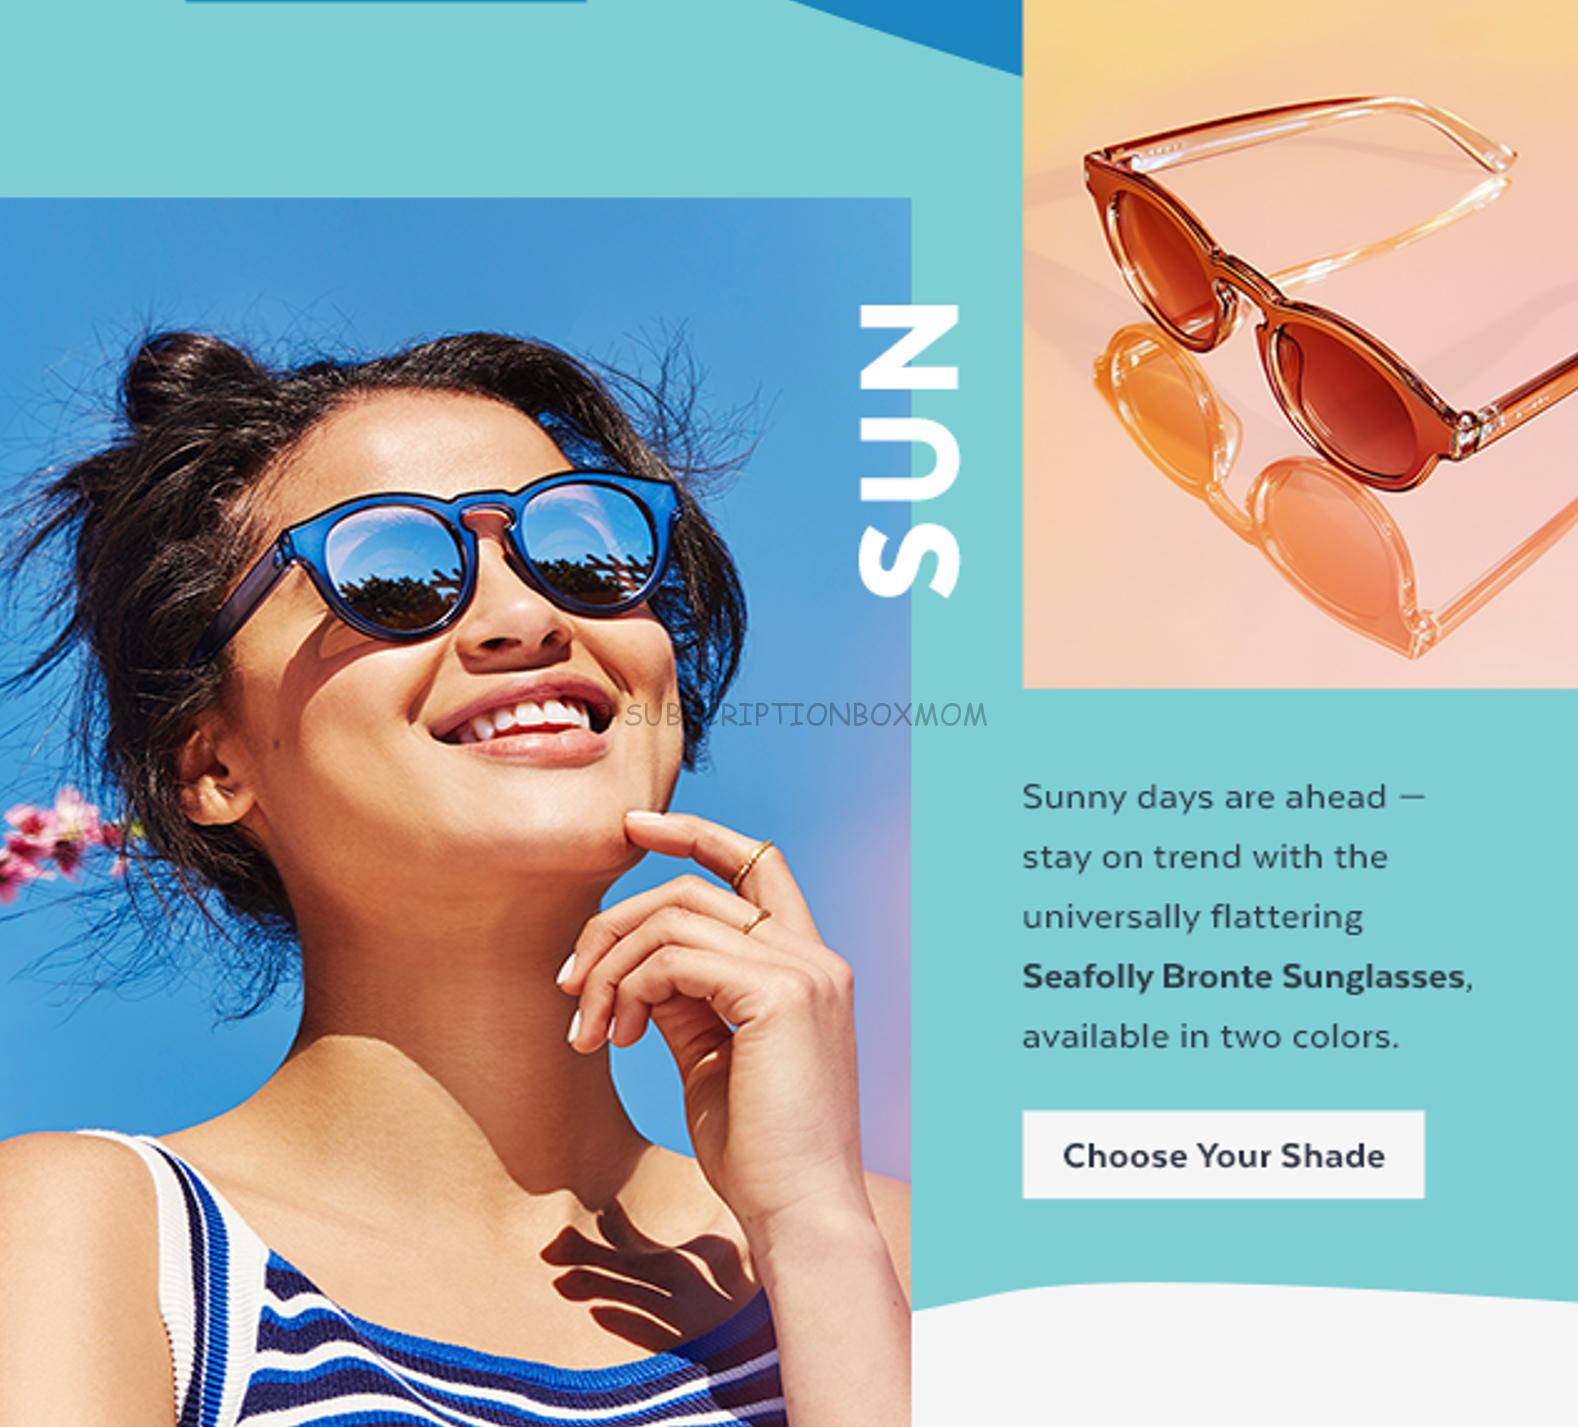 Seafolly Bronte Sunglasses